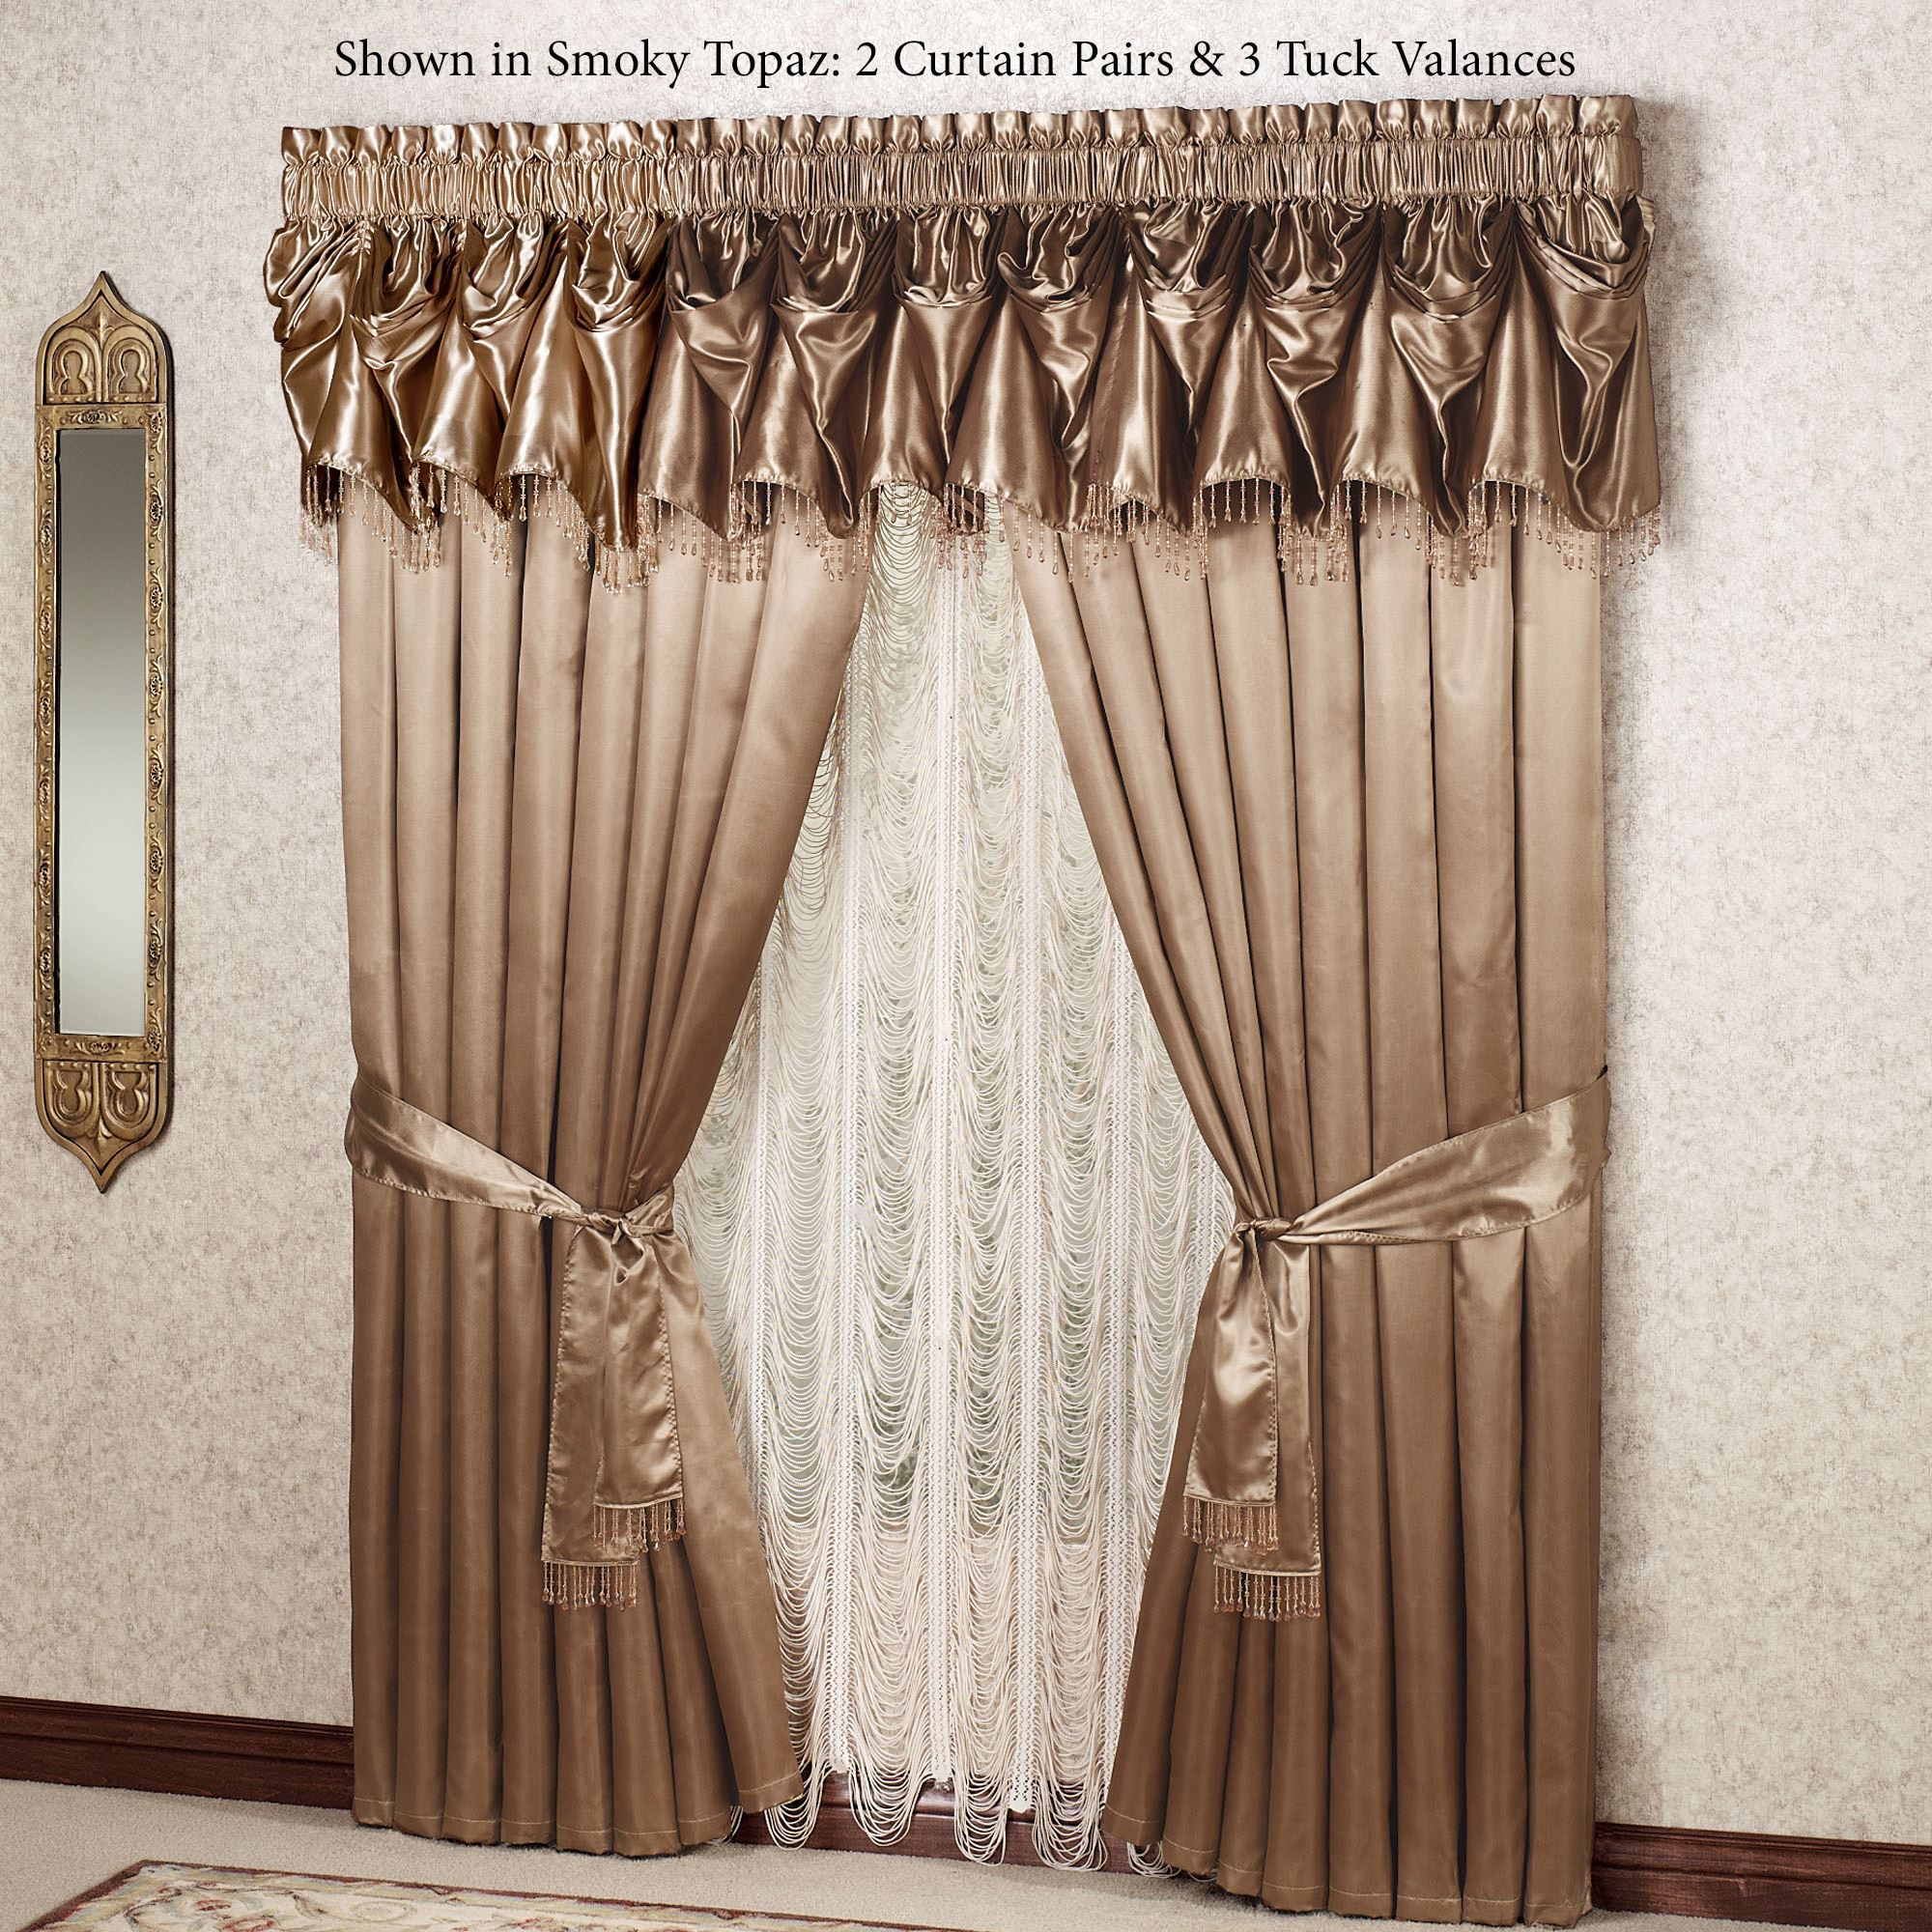 Portia Ii Tuck Valance Window Treatments